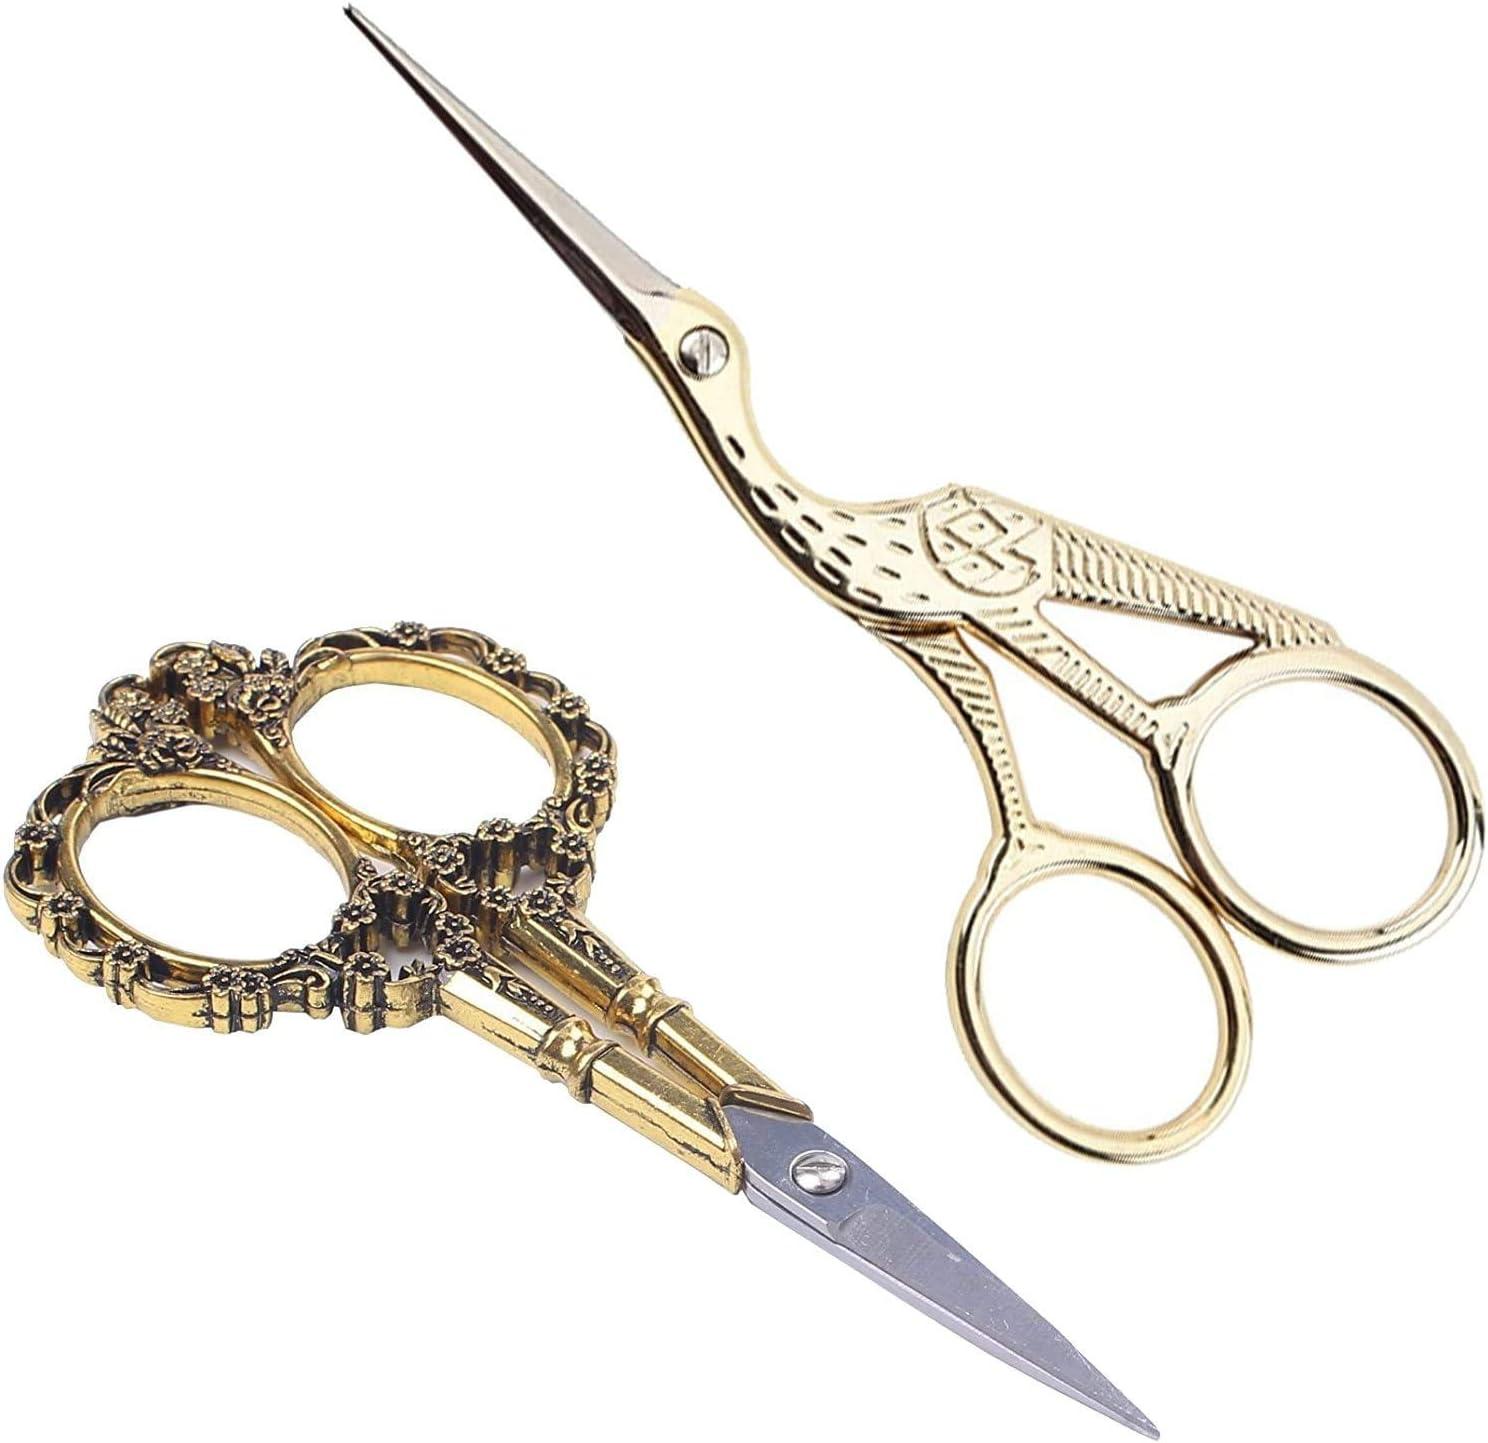 Titanium Tailor/'s Scissor Handicrafts gift for musician. GOLD GUITAR Scissors Zakka Sewing Supplies Vintage scissor music lover